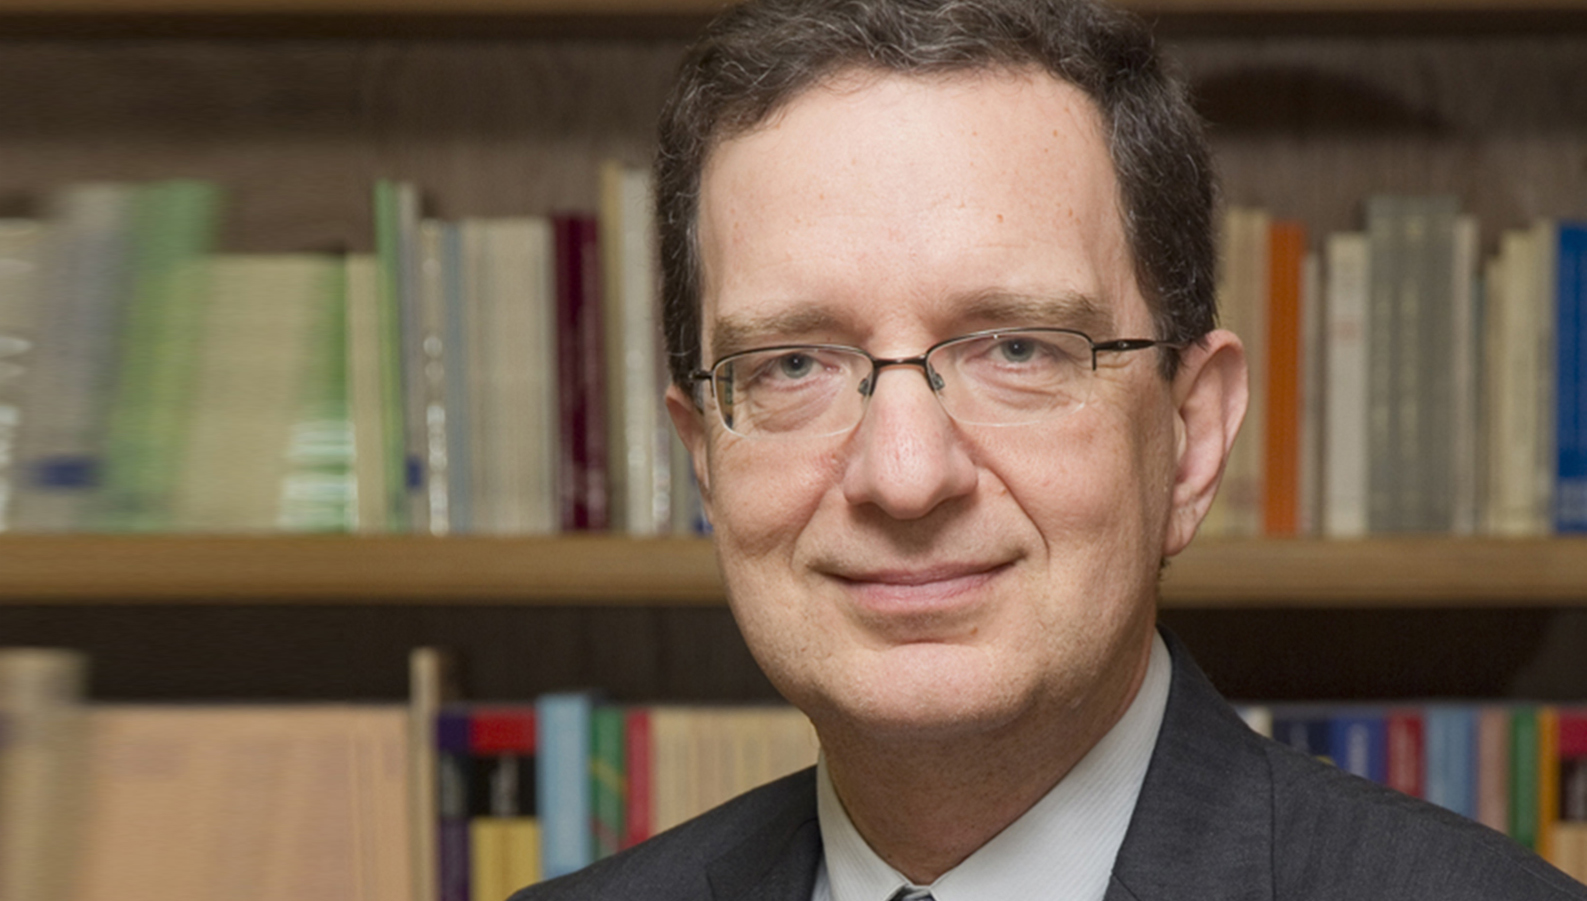 (intervju) Michael Haliassos o novi finančni krizi